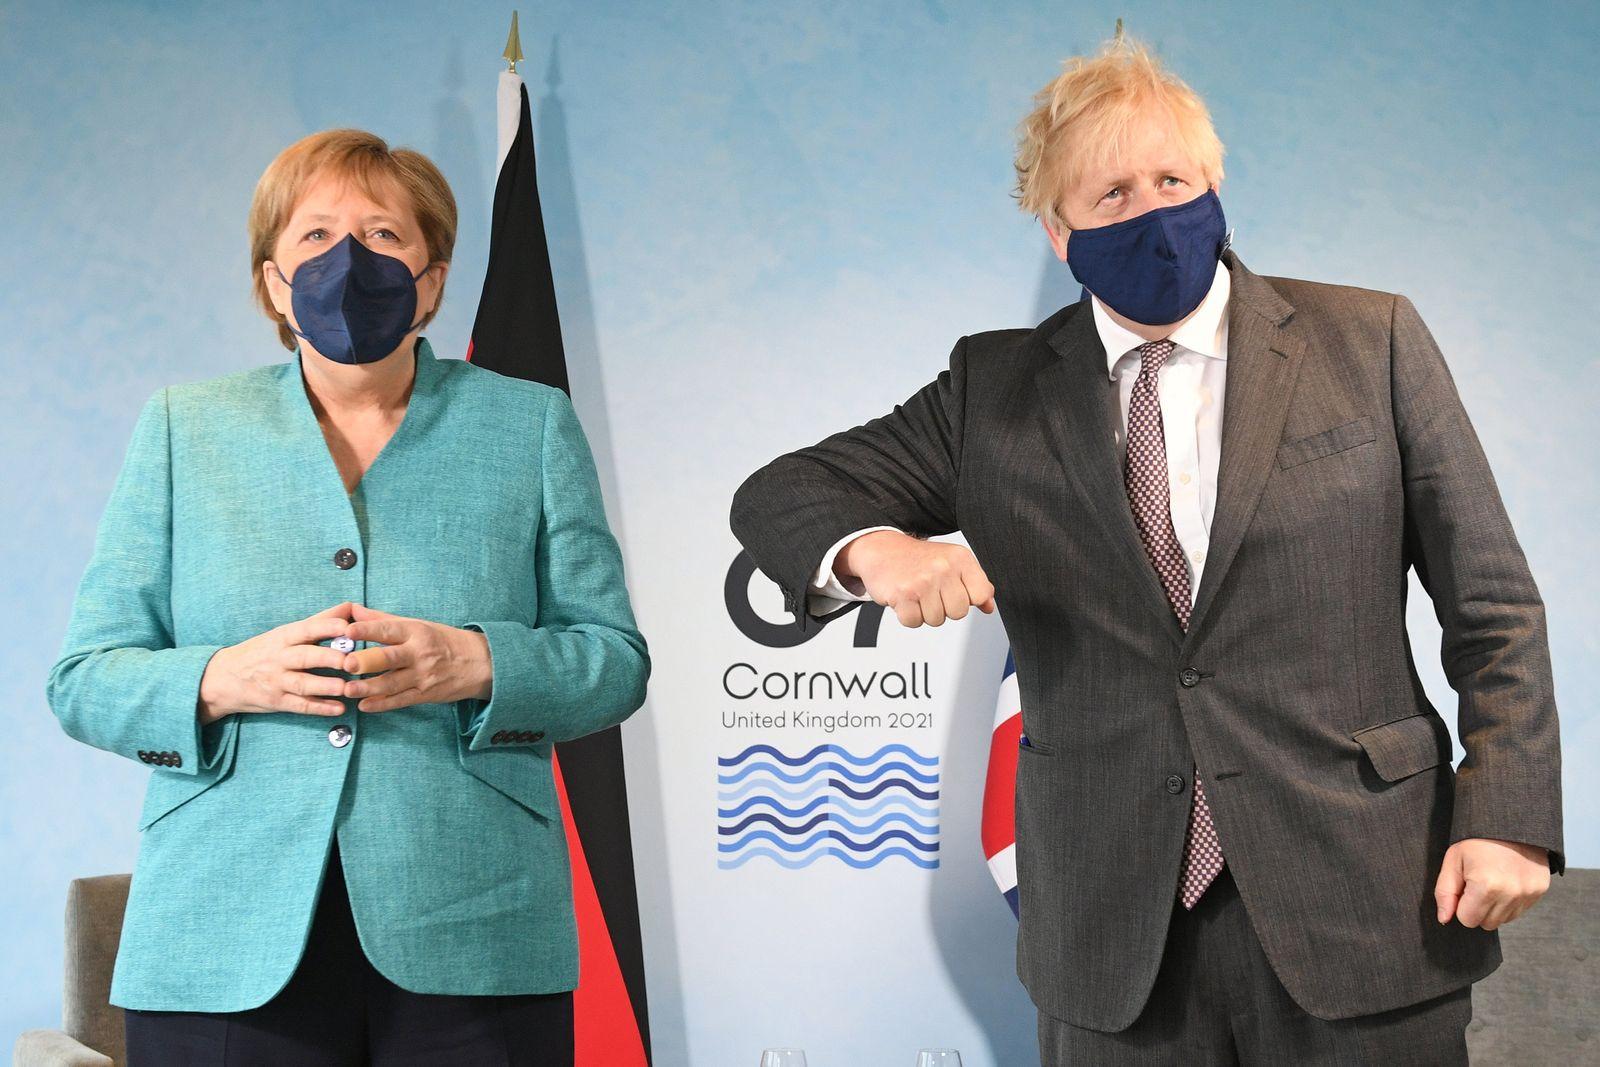 G7-Gipfel in Carbis Bay